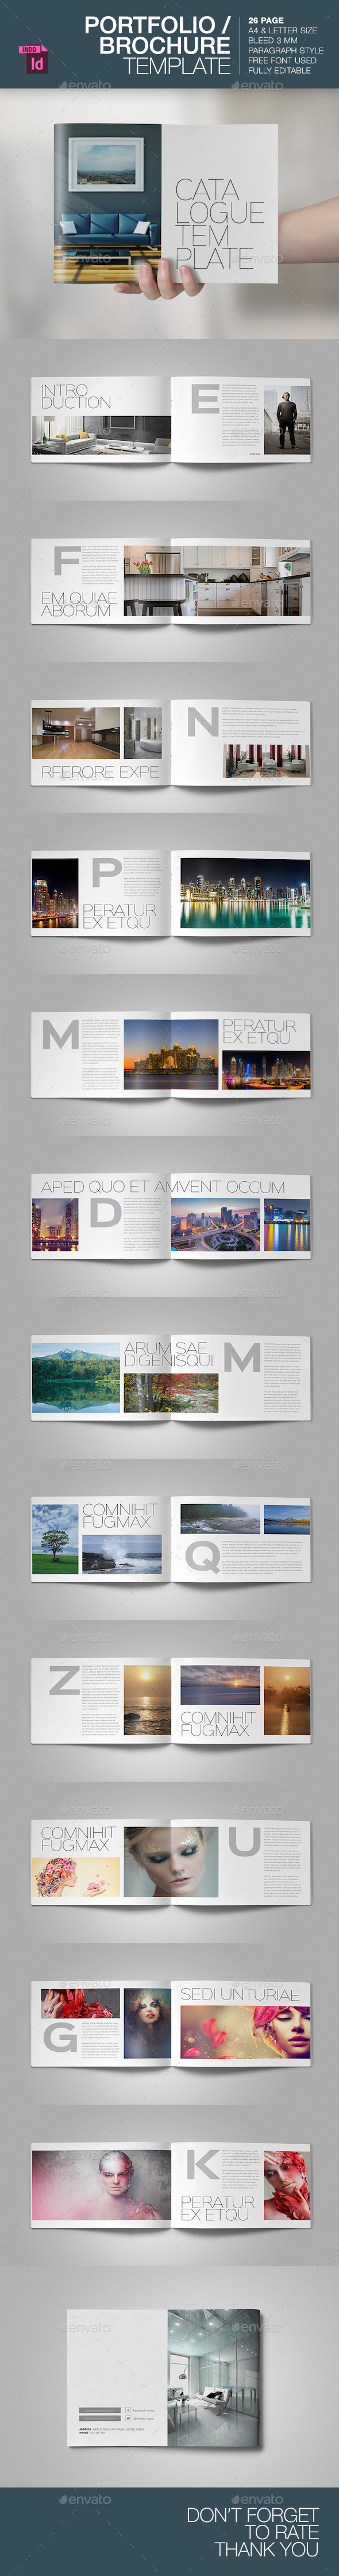 Portfolio / Brochure Template - Brochures Print Templates